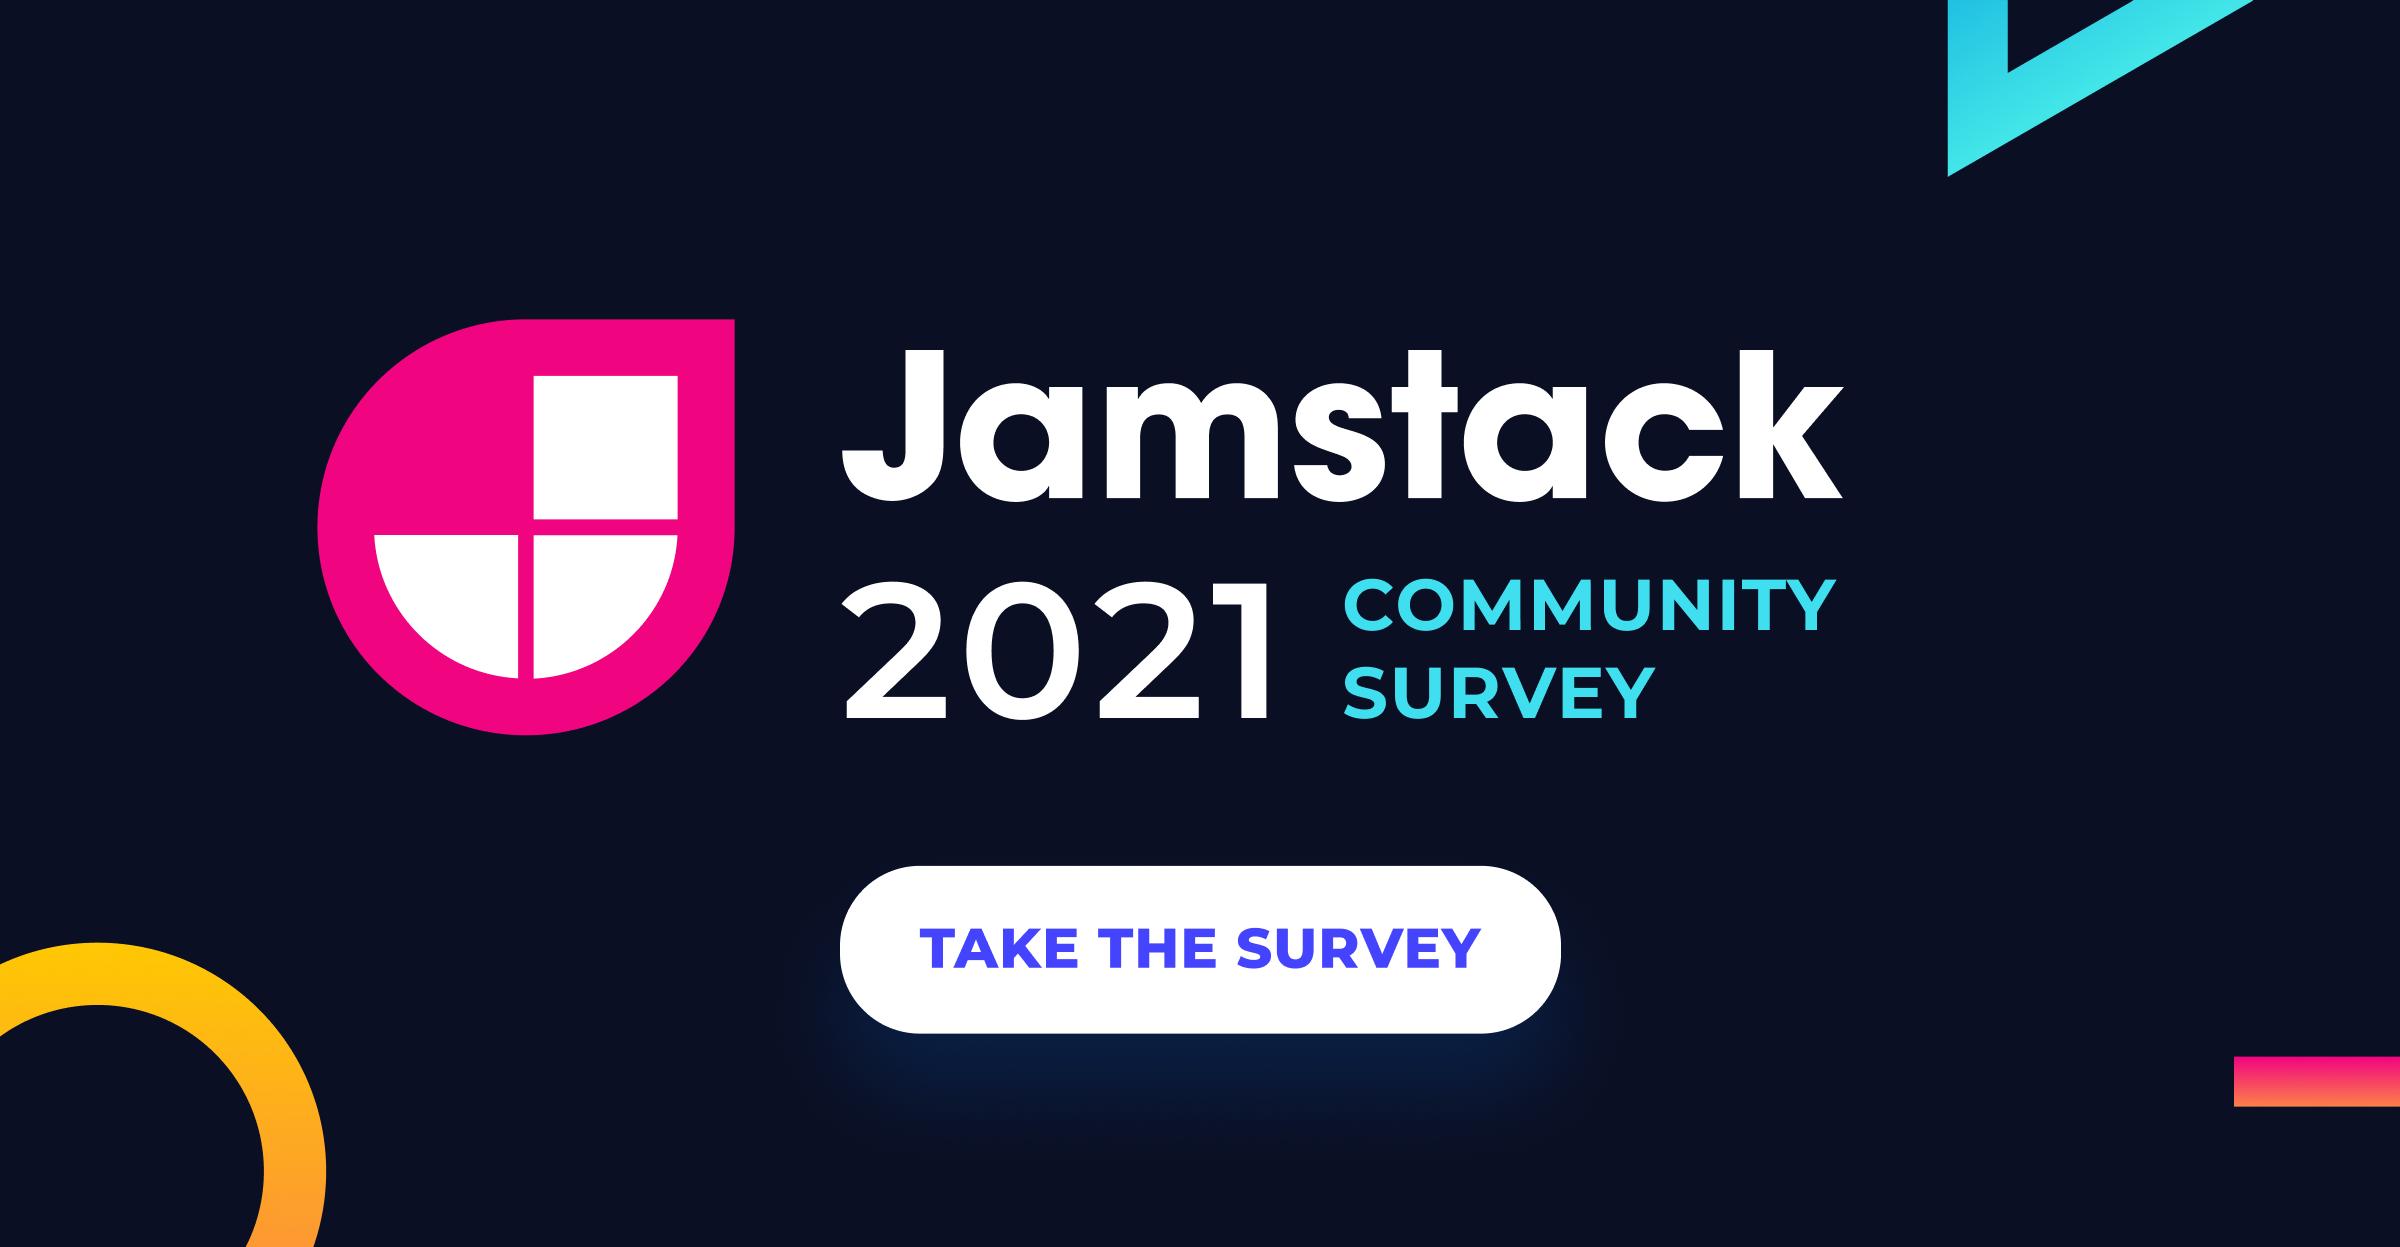 Jamstack Community Survey 2021 3